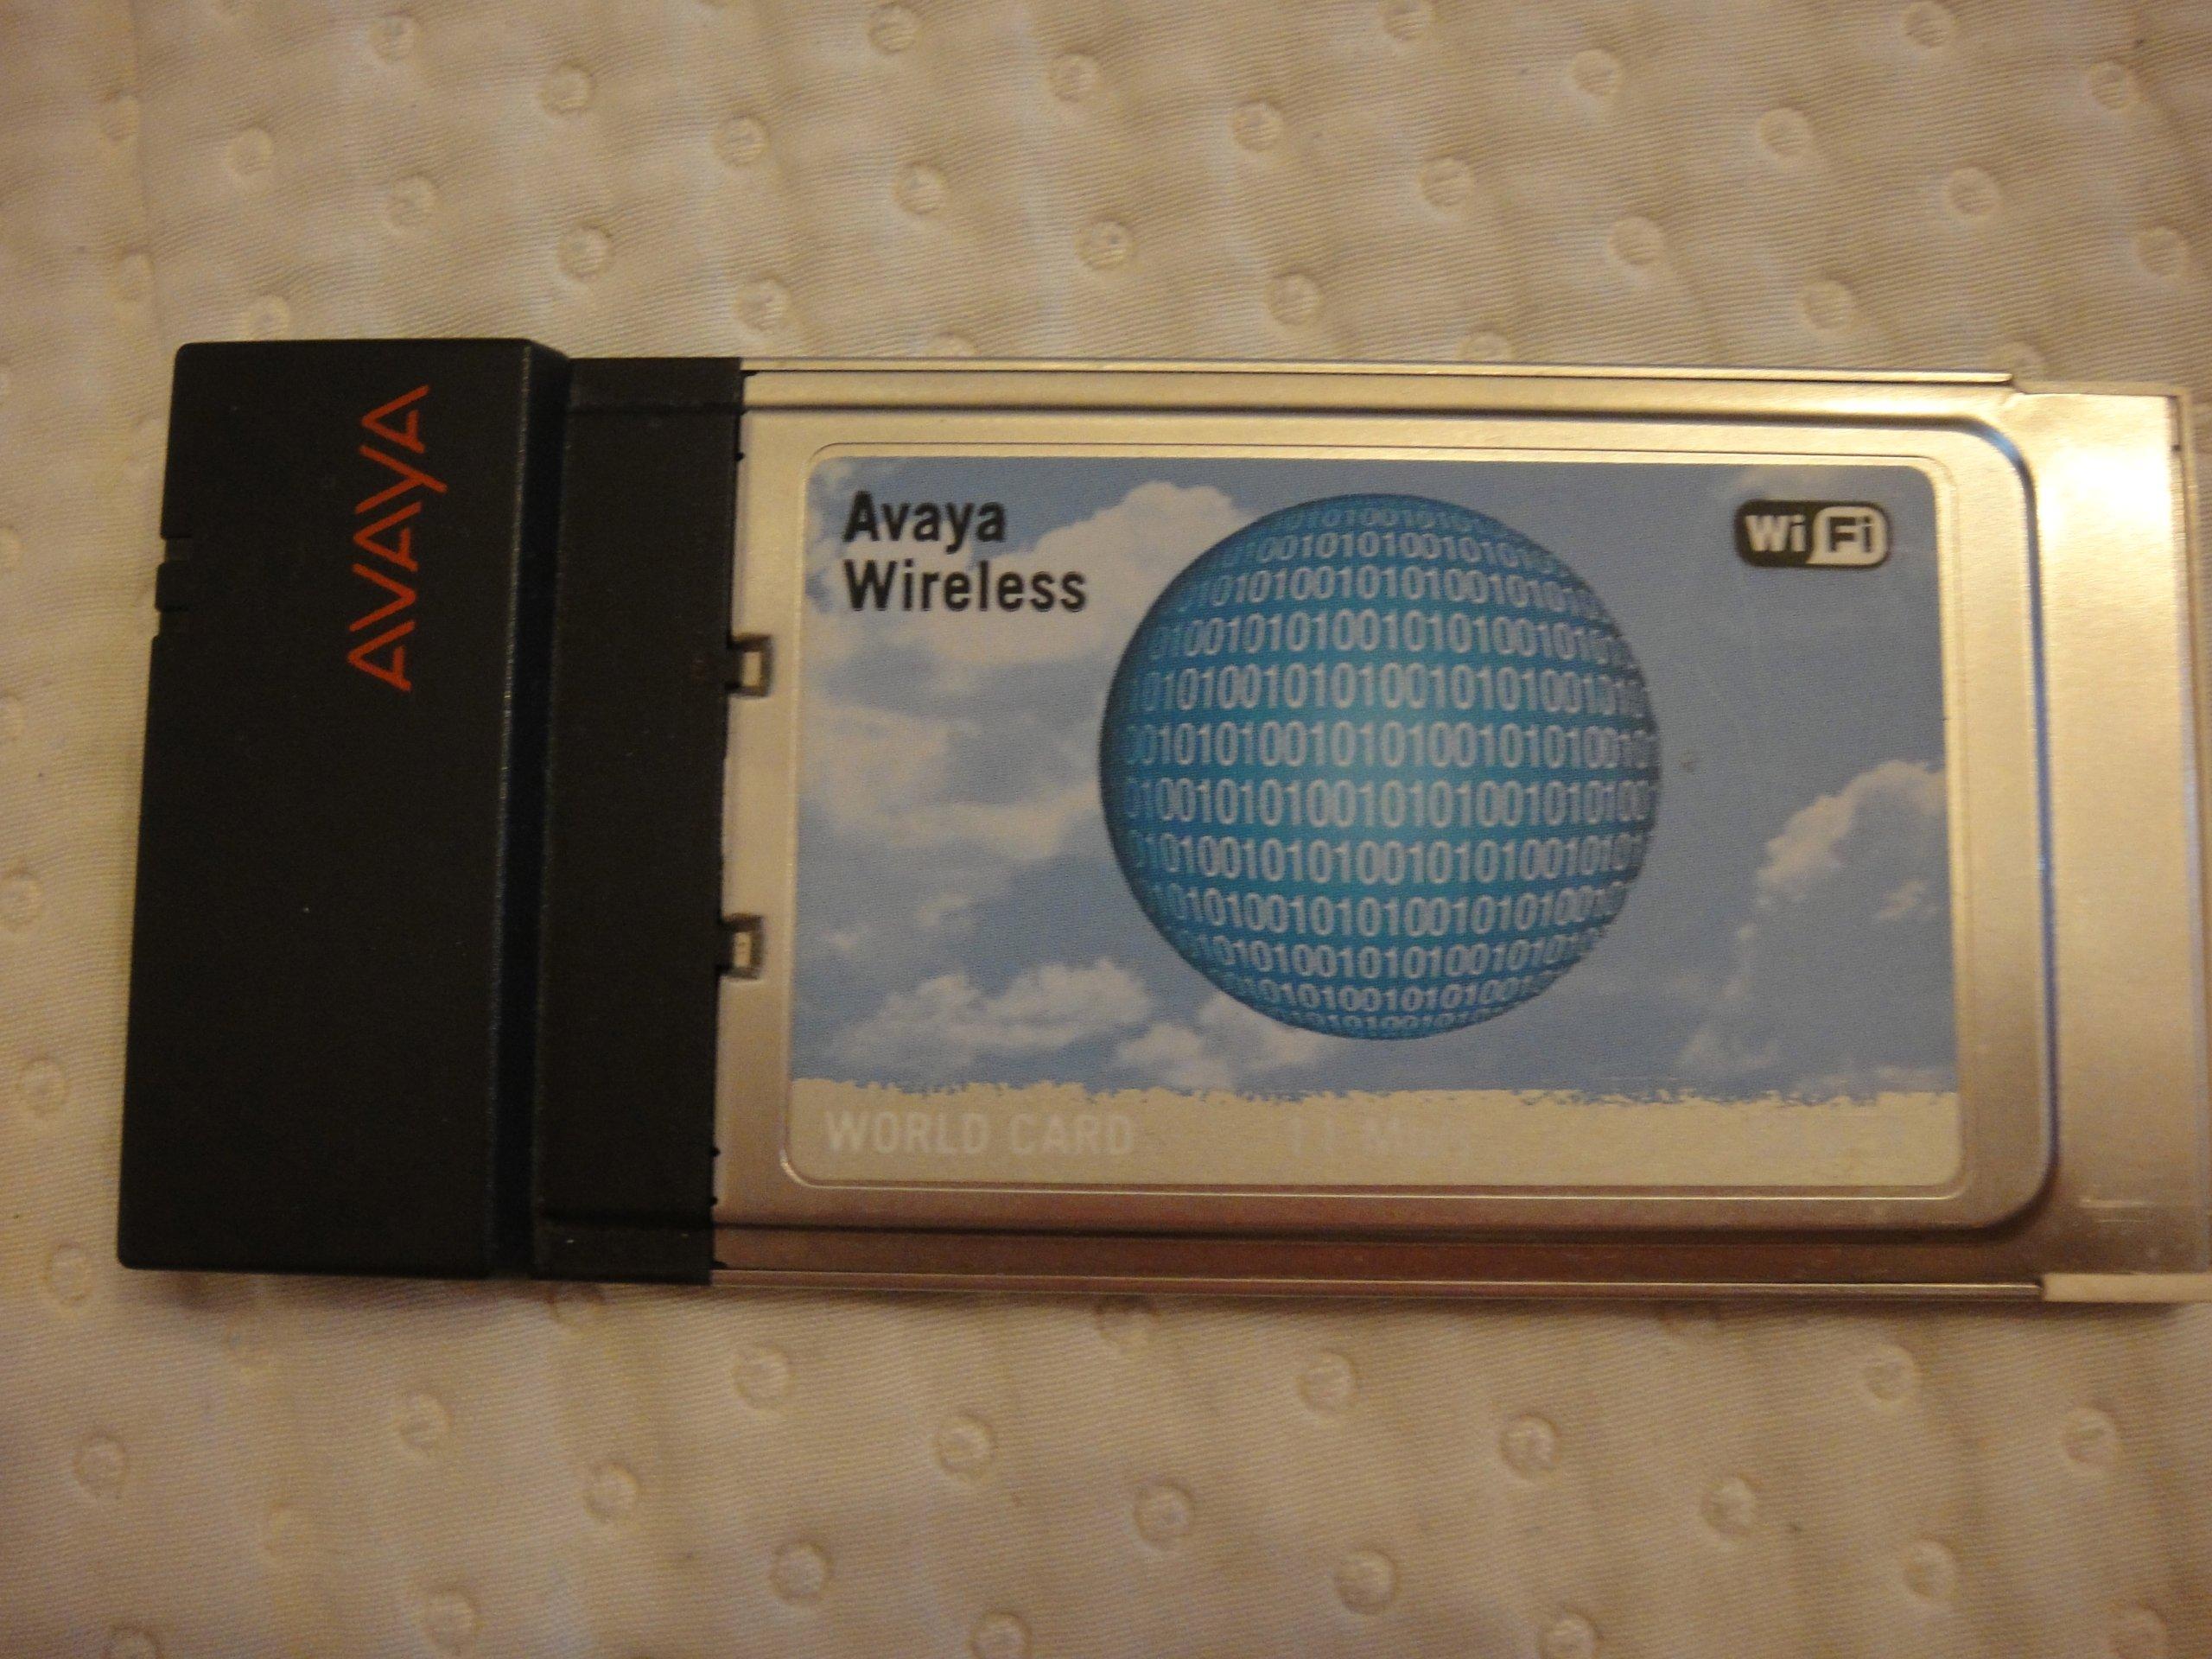 AVAYA WIRELESS WORLD CARD SILVER WINDOWS 8 X64 DRIVER DOWNLOAD